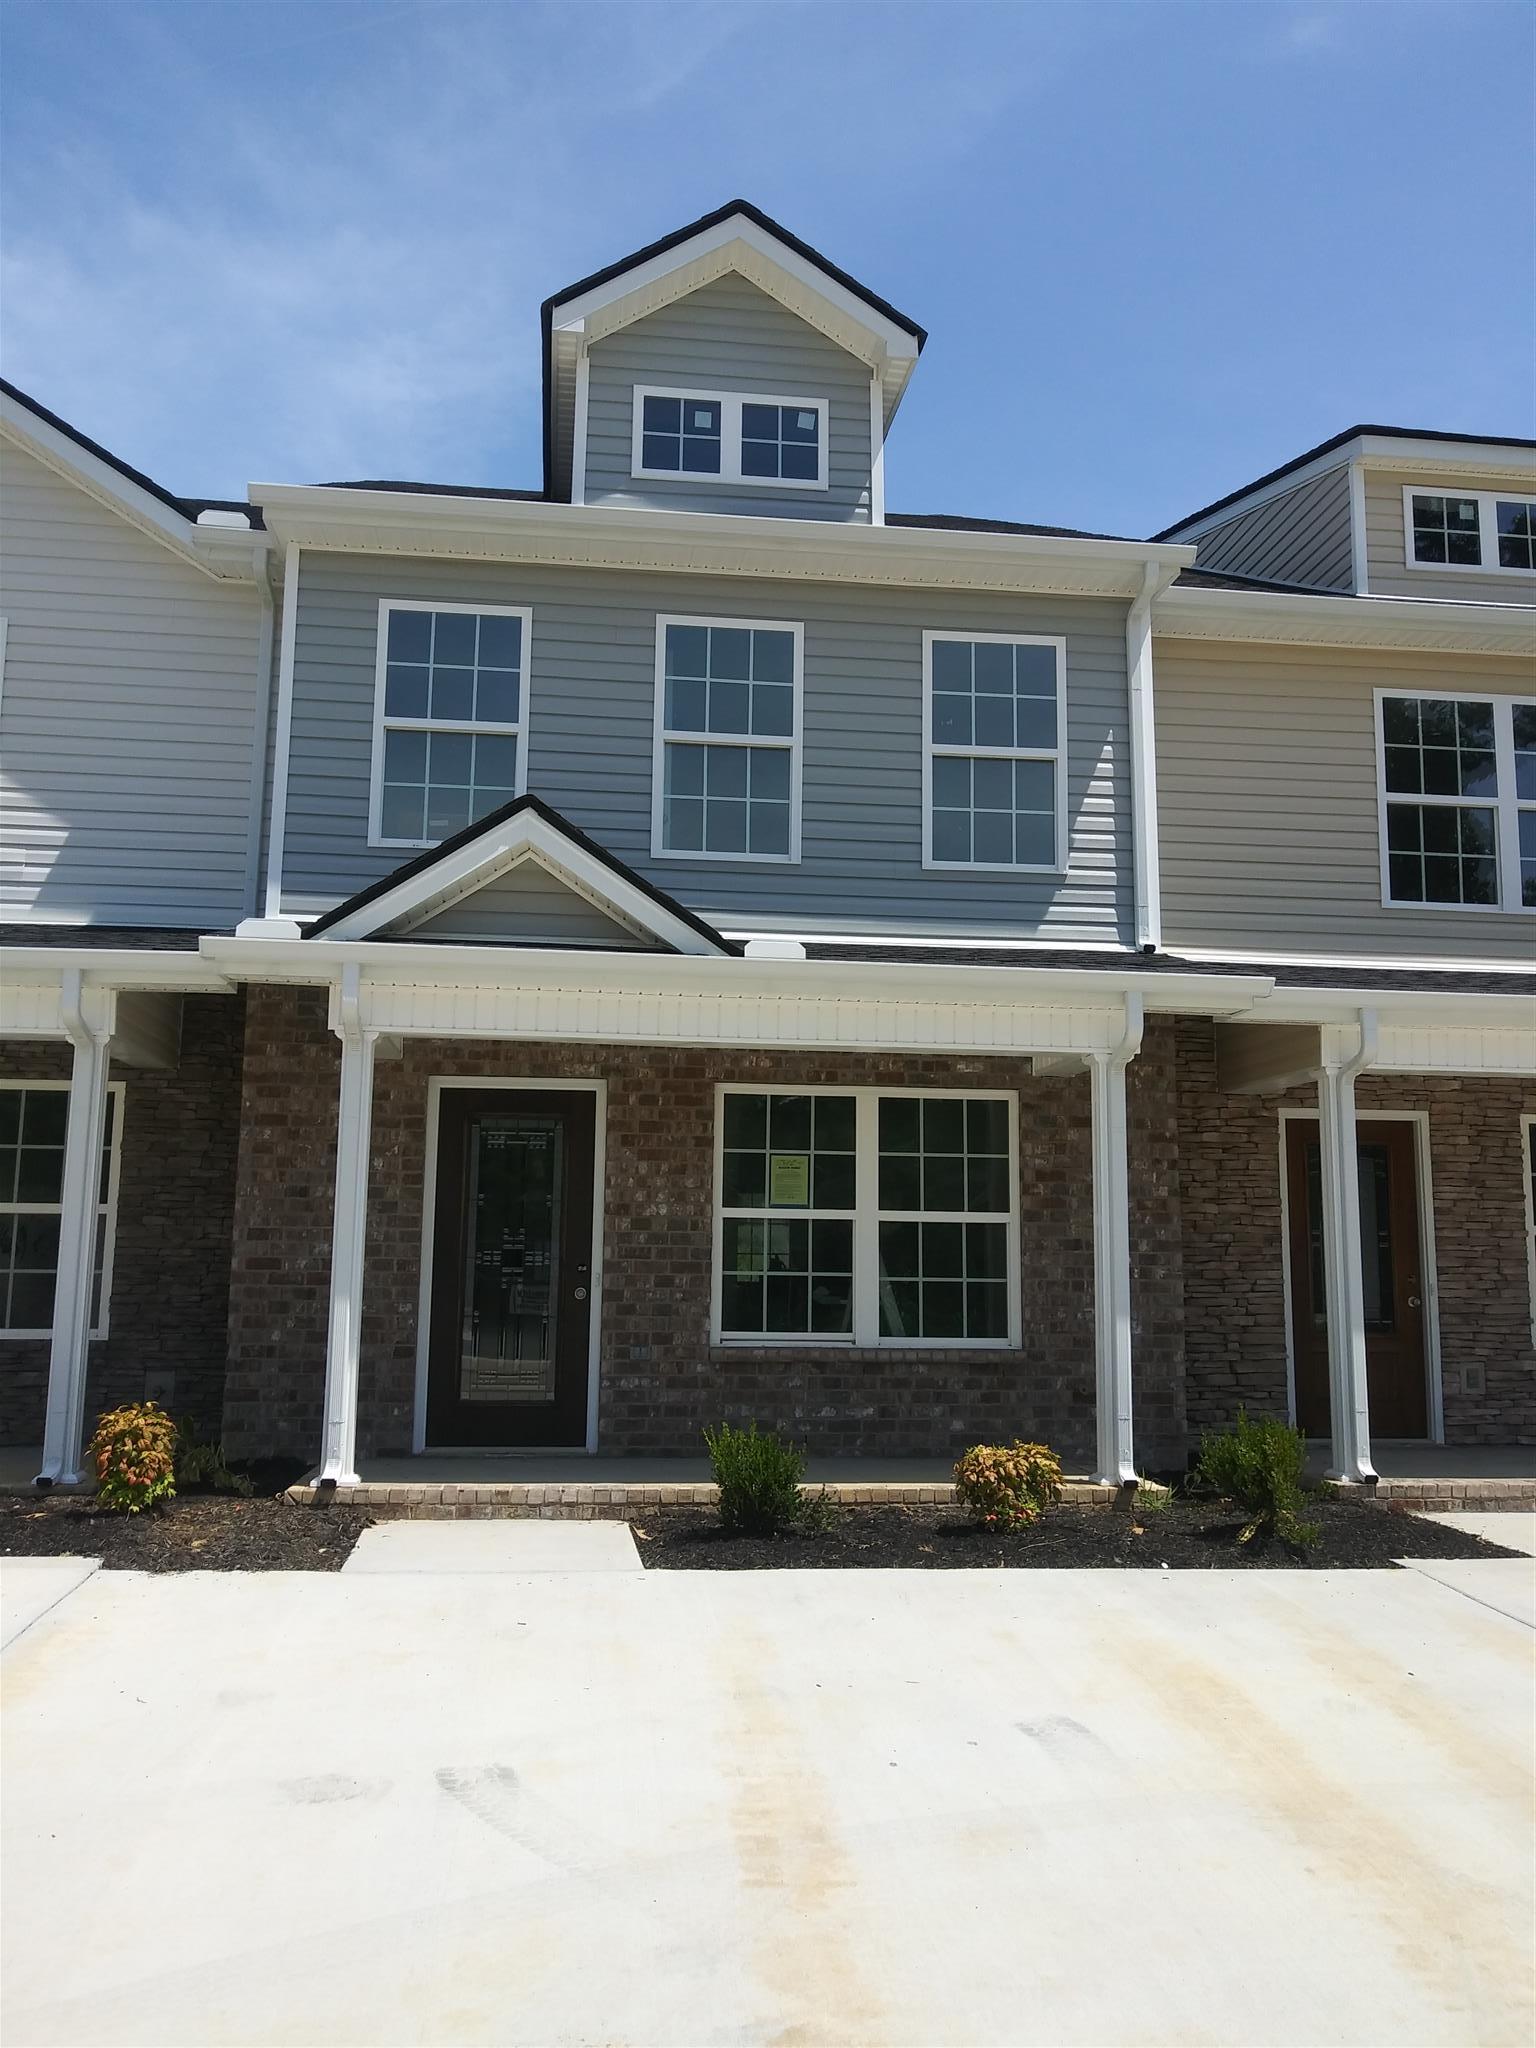 17 Lot 17 Downstrean , Ashland City, TN 37015 - Ashland City, TN real estate listing